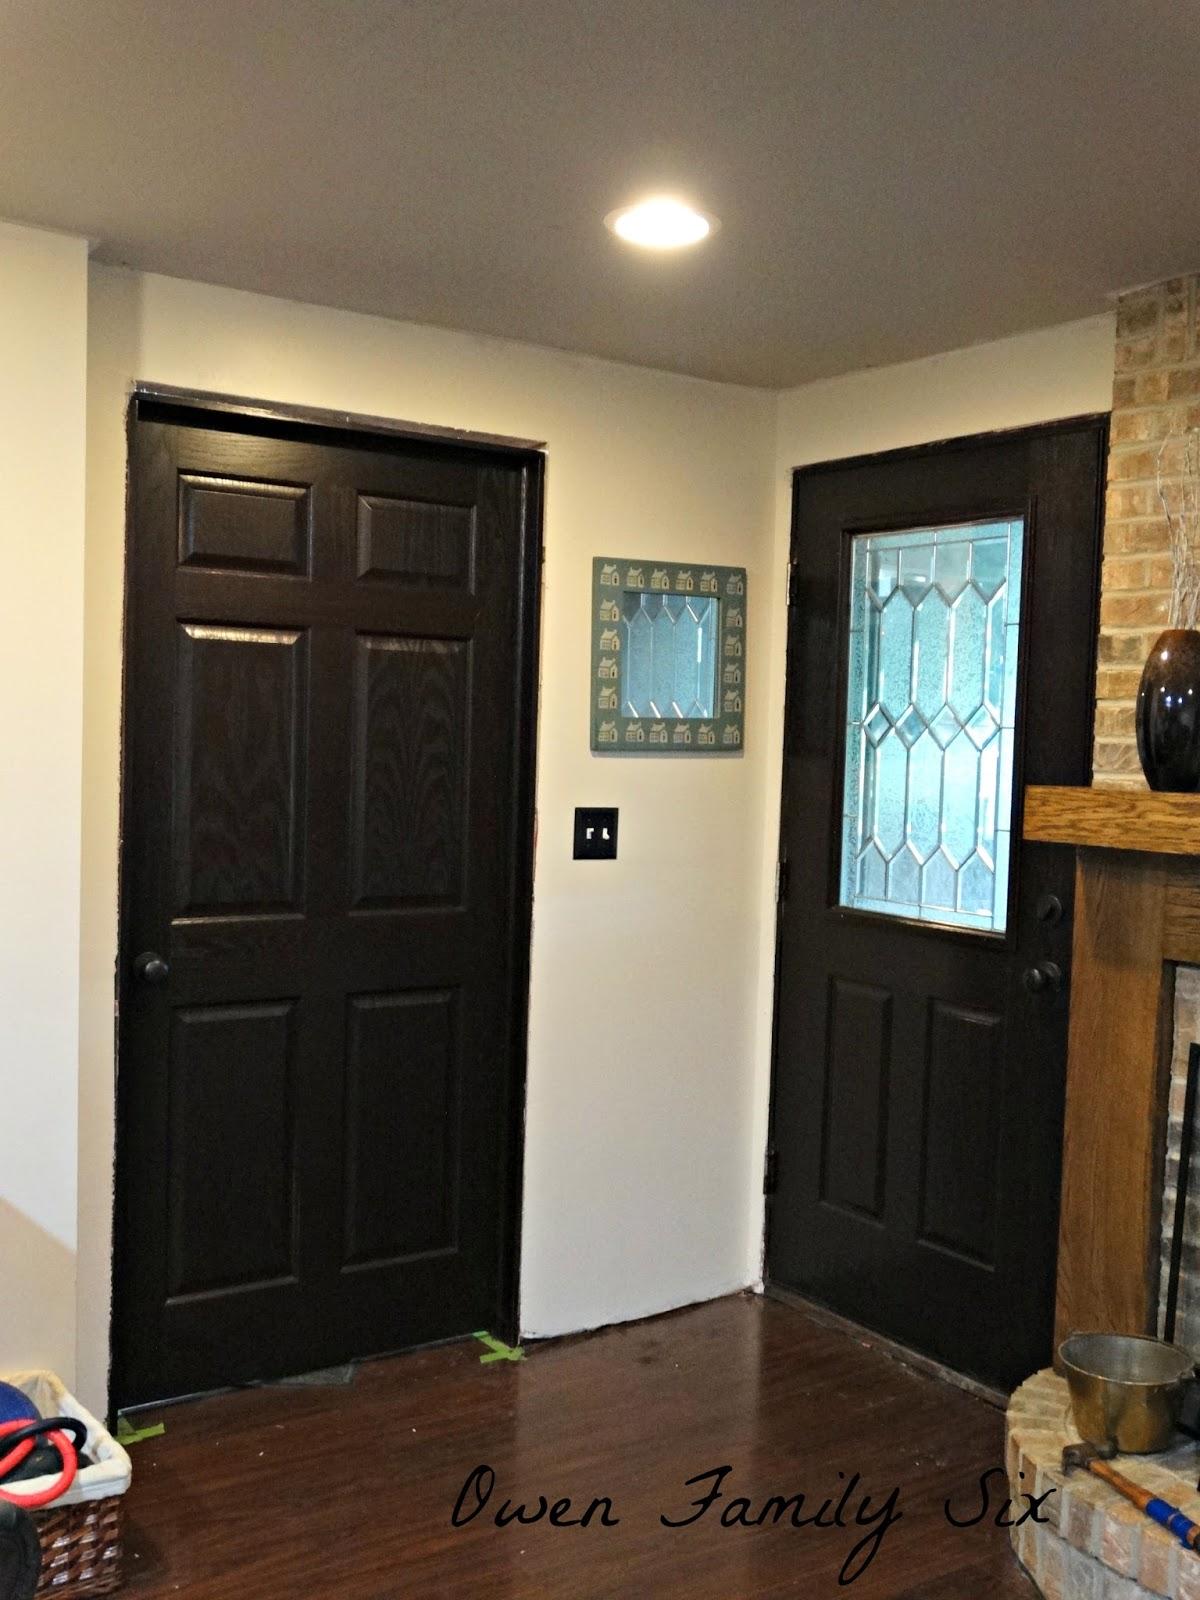 Owen Family Six Basement Doors